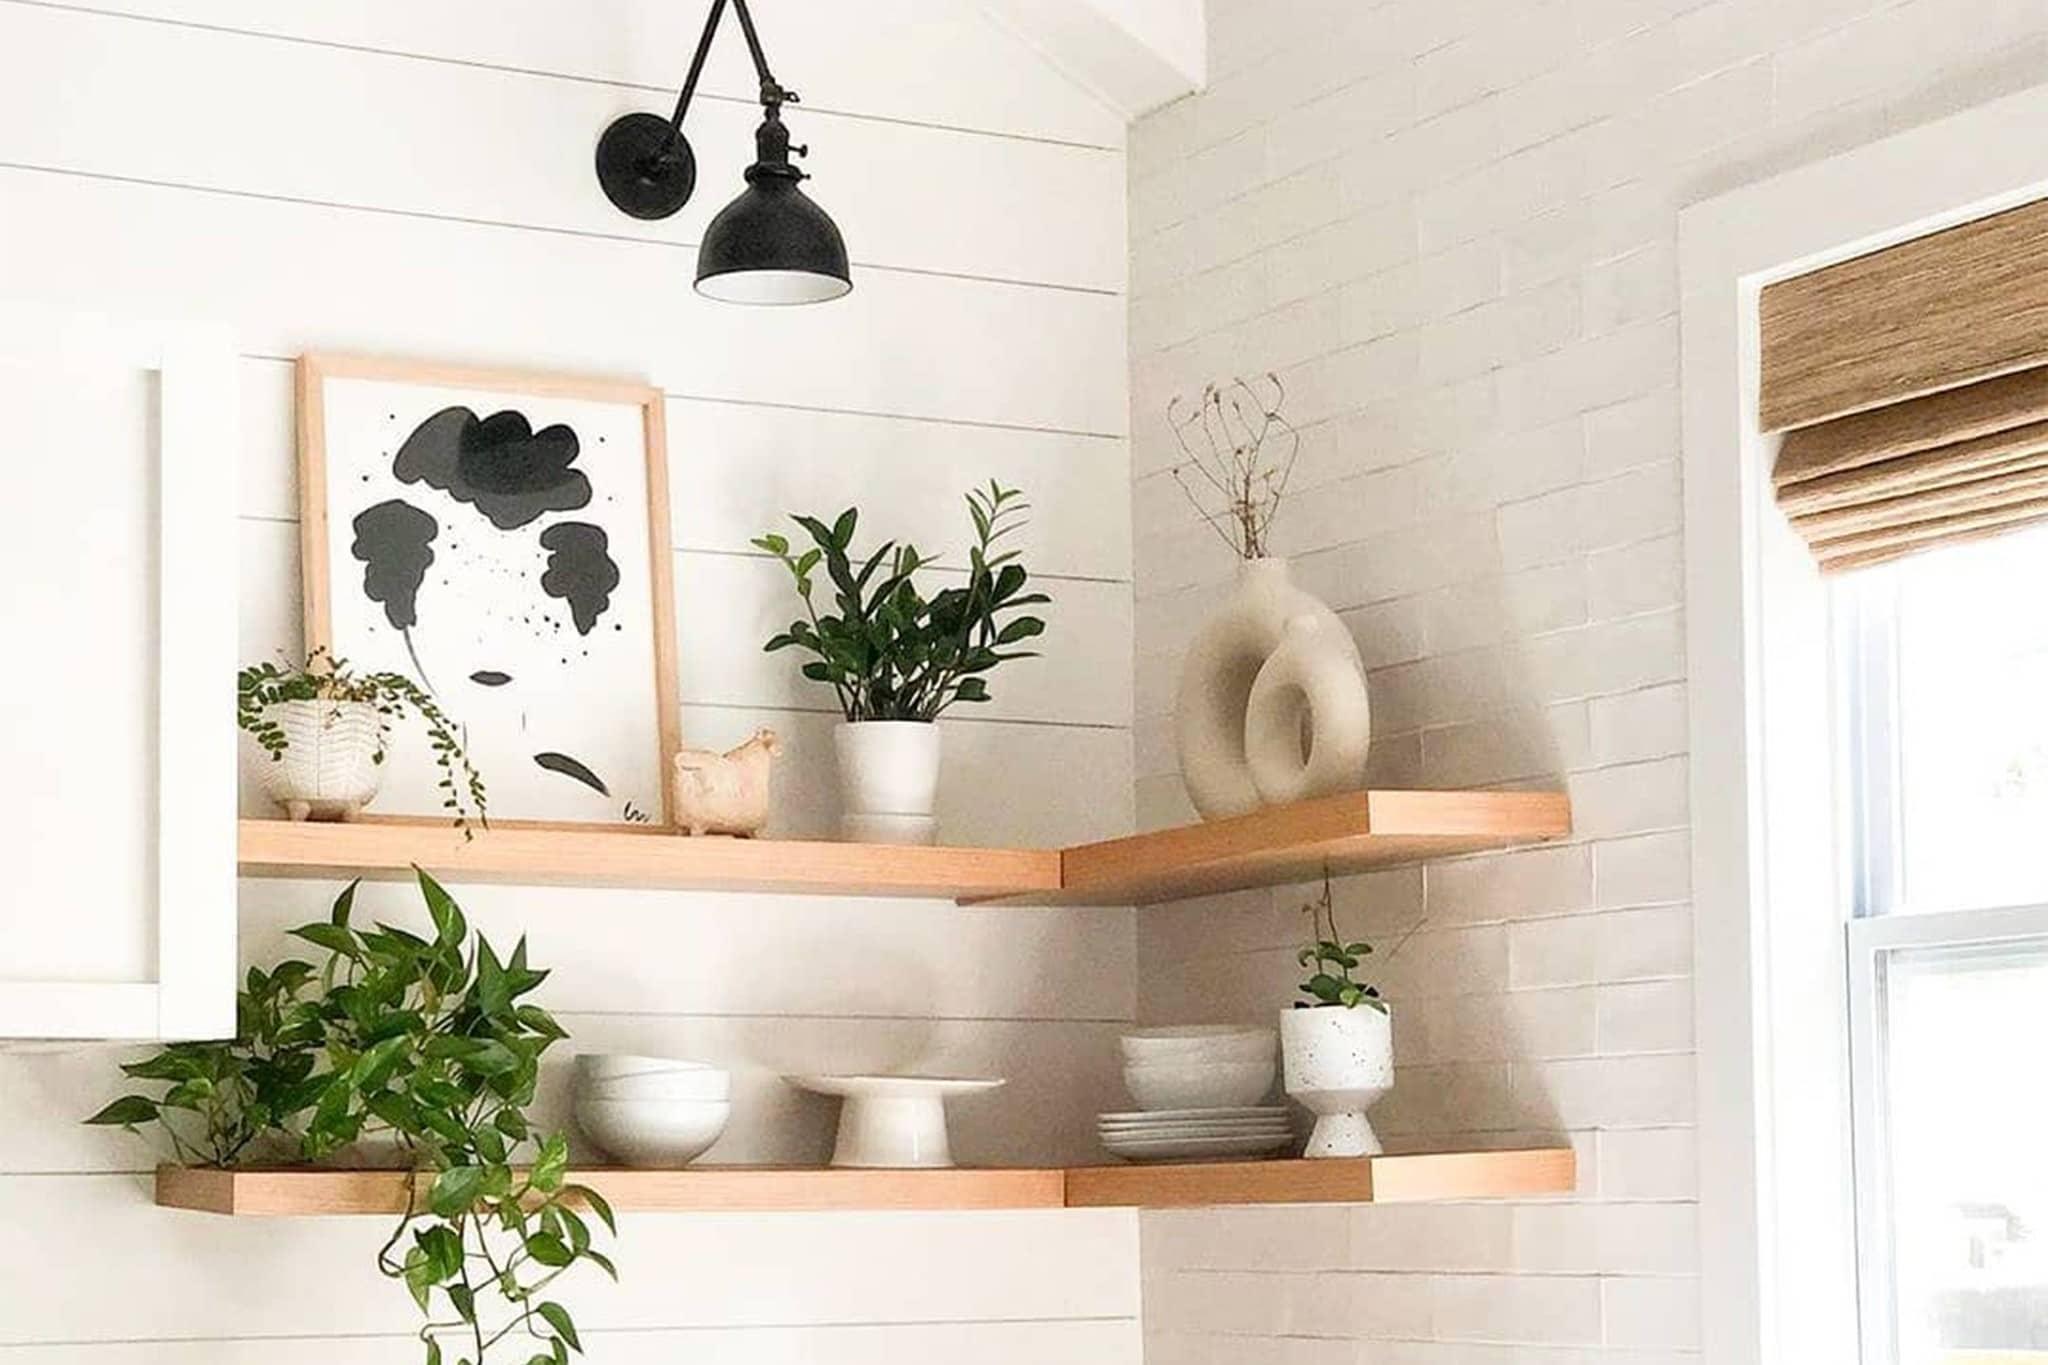 Floating Shelves installation